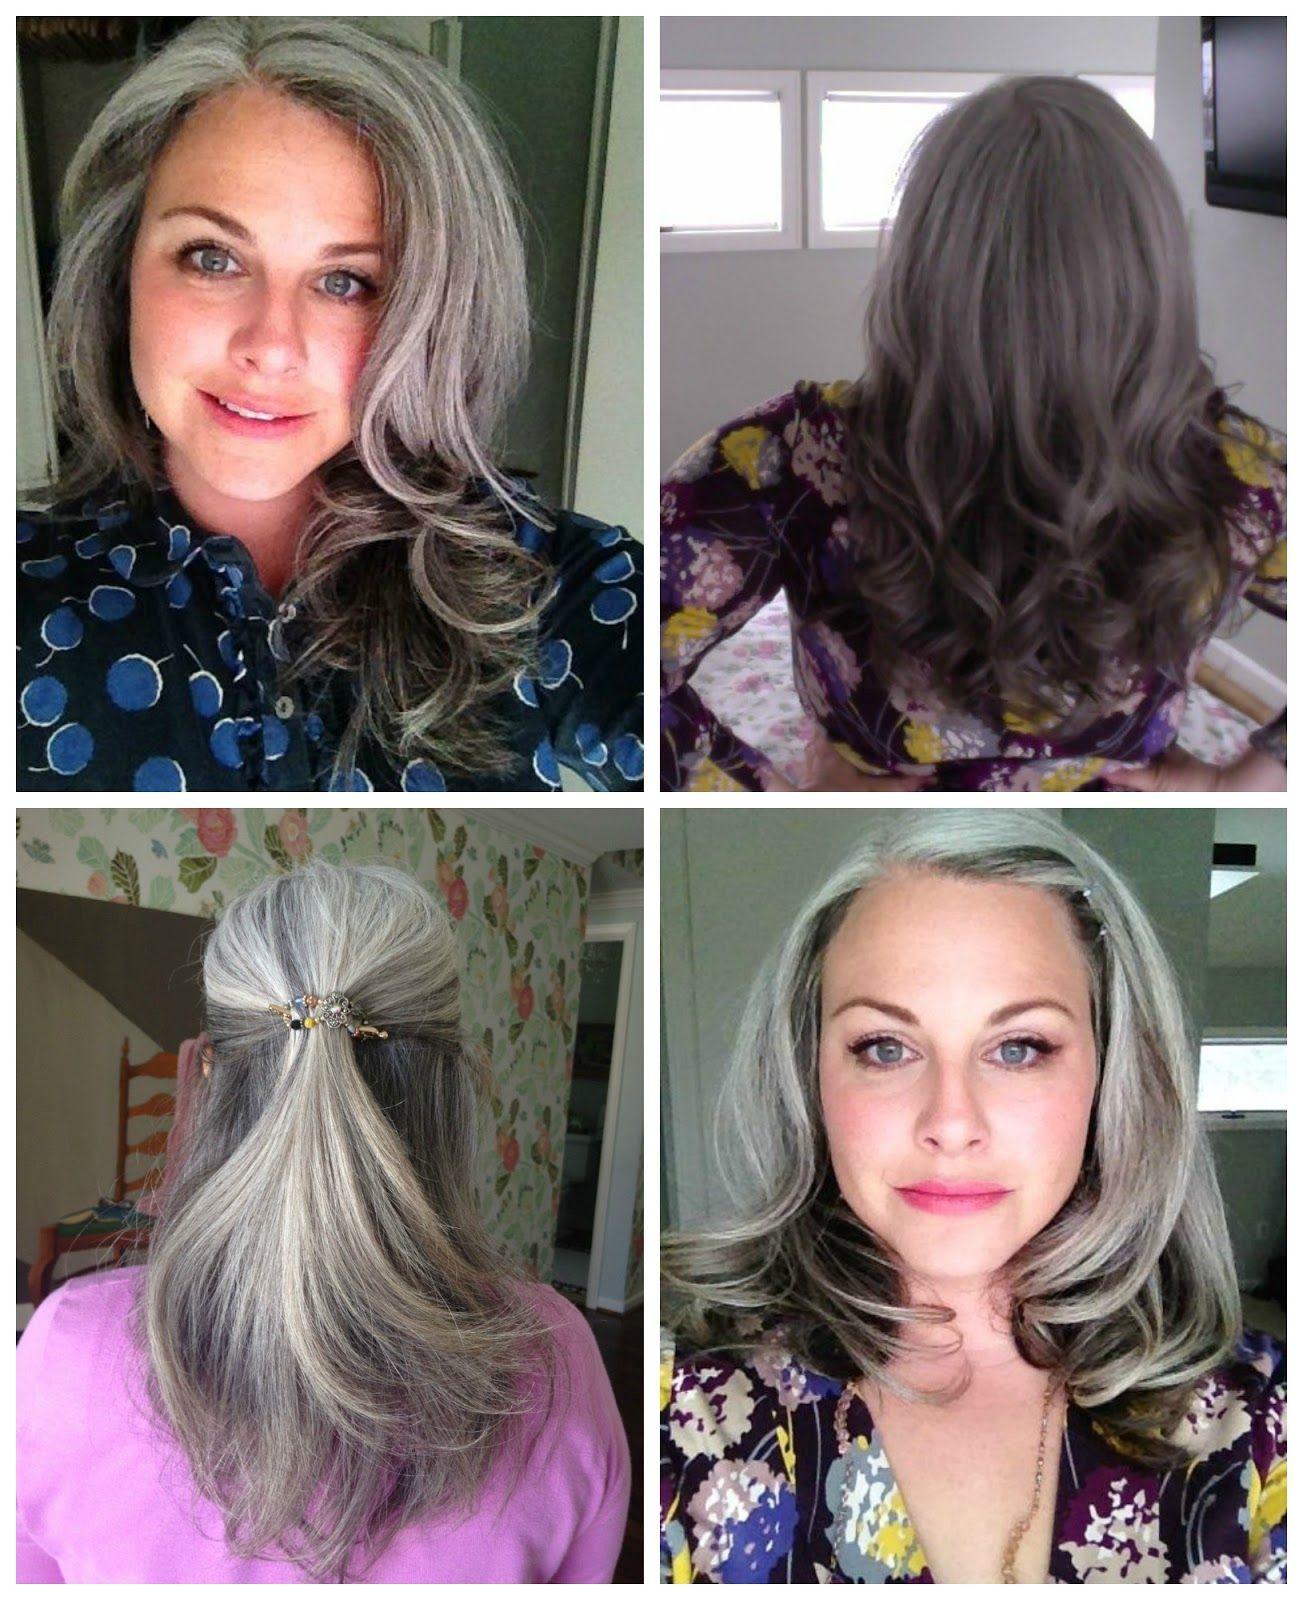 369d3673af806b810a742aac34c6714e - How Long Does It Take To Get White Hair